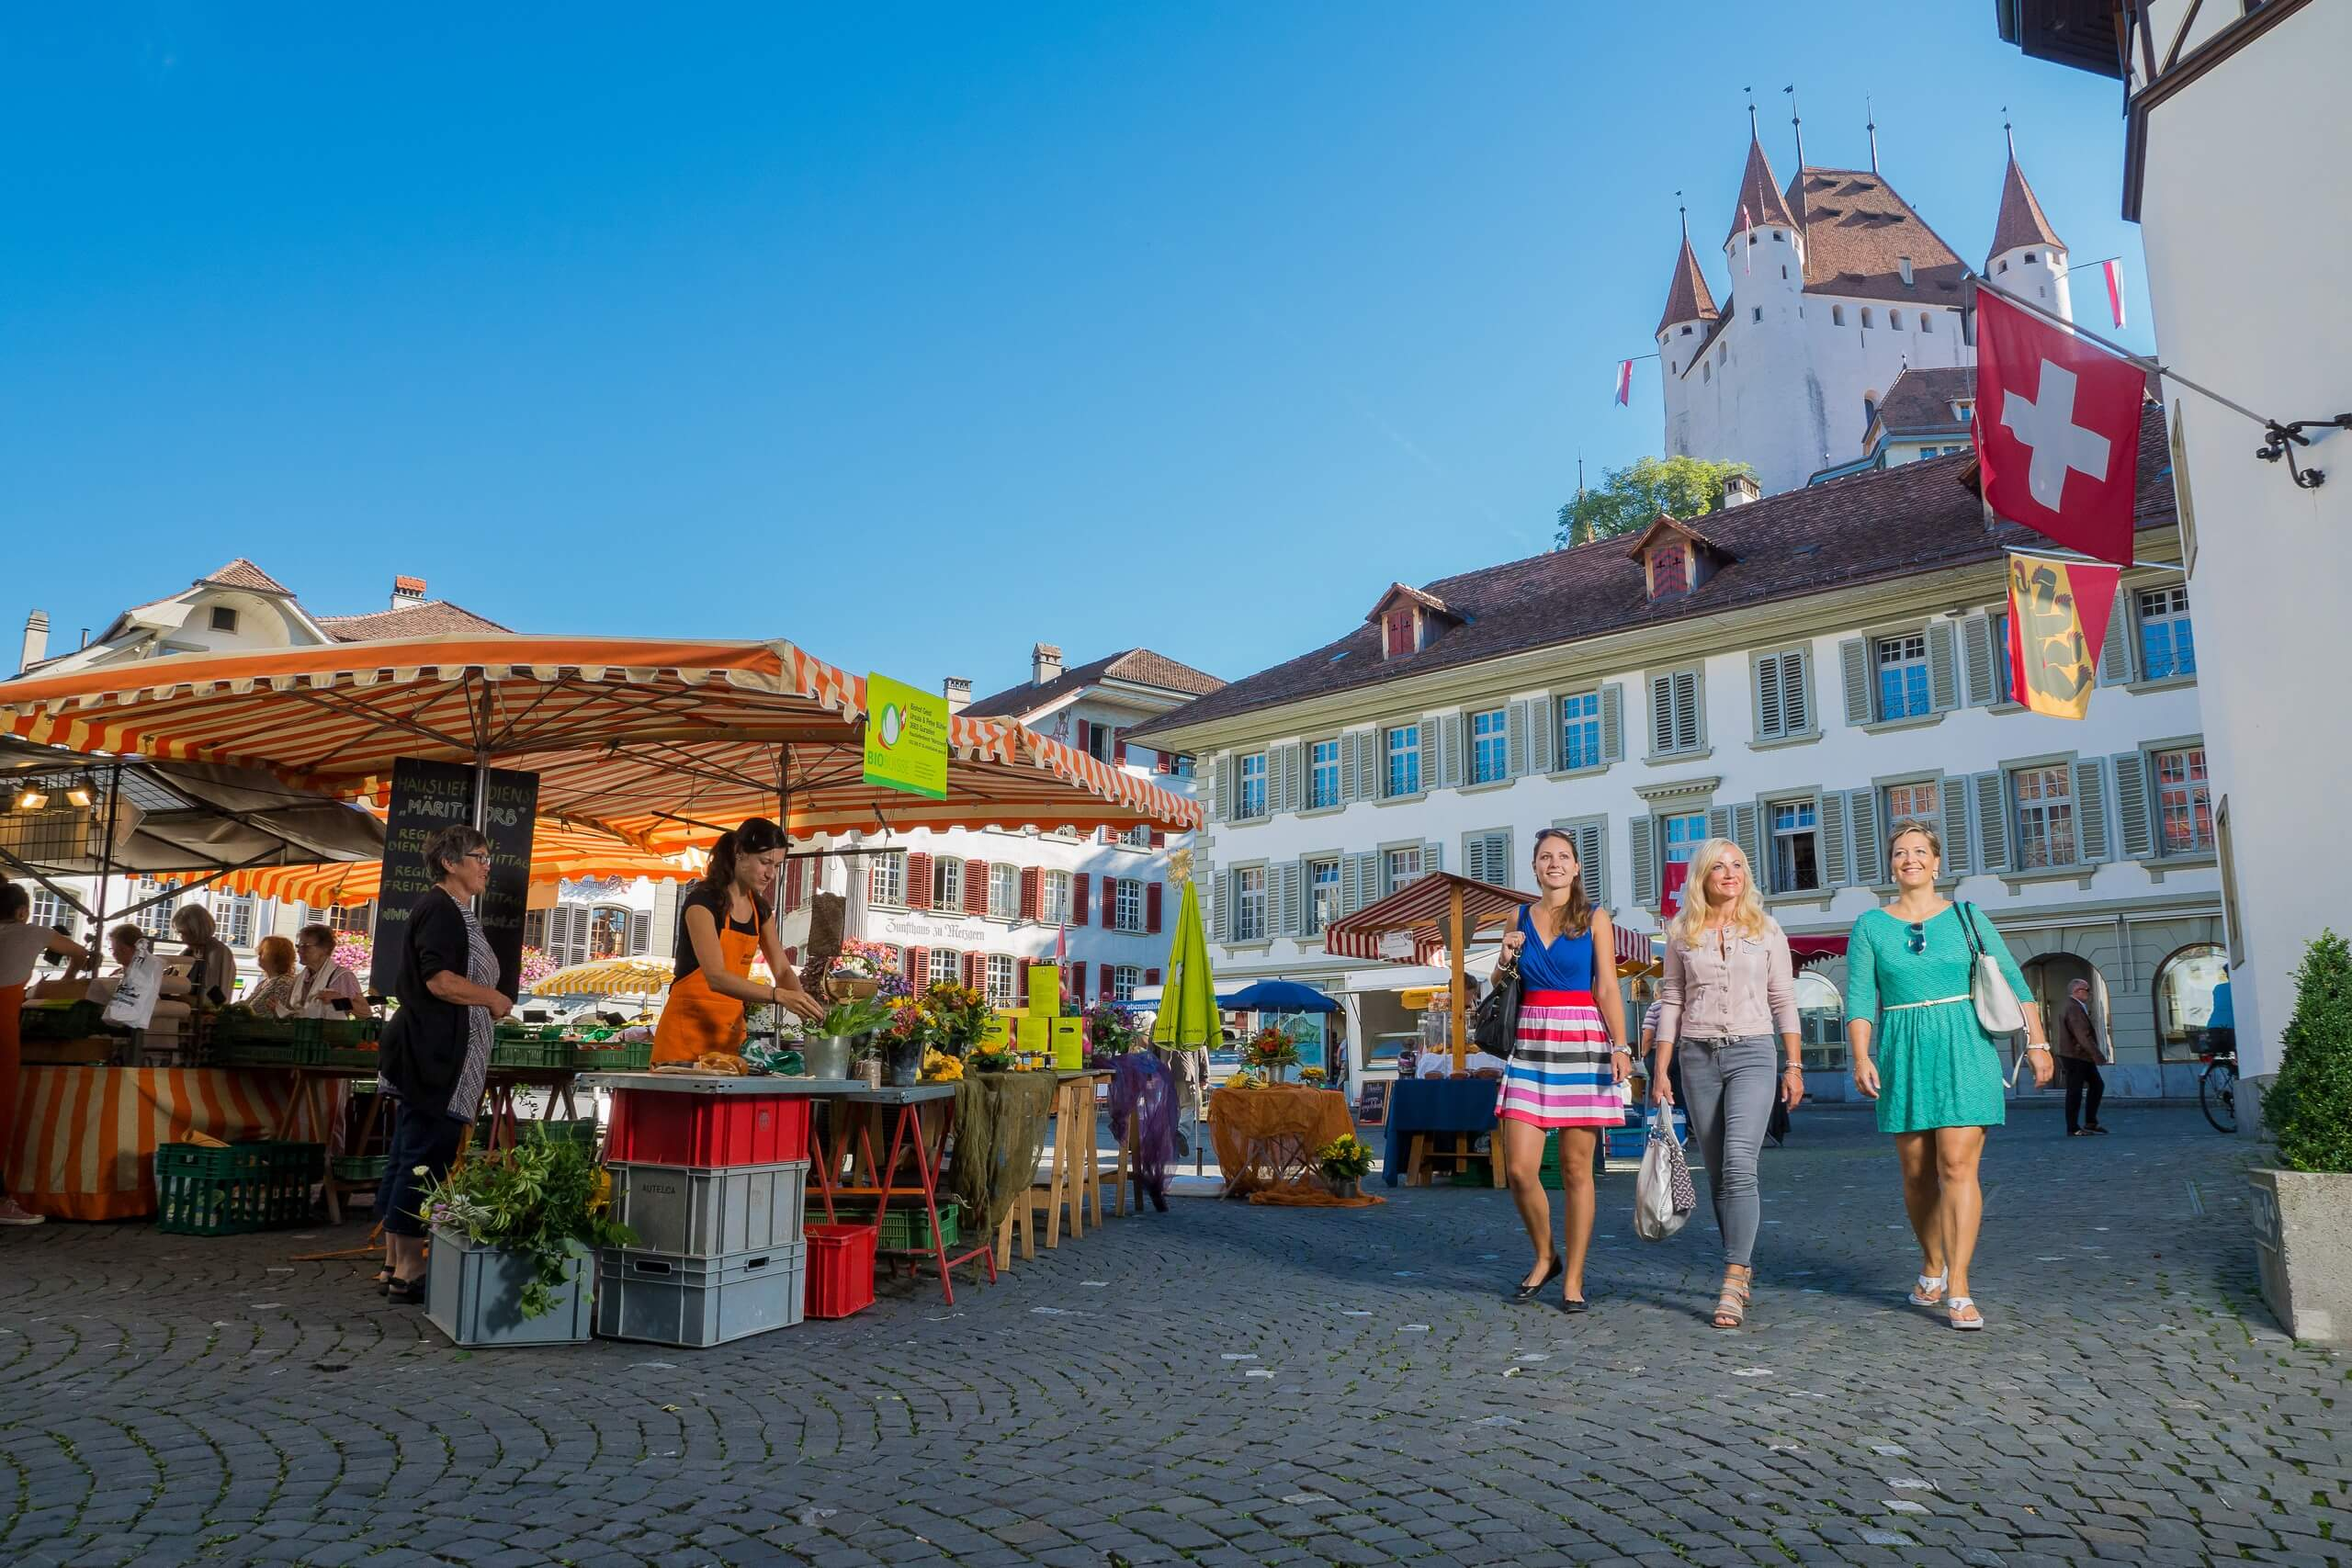 thun-shopping-sommer-rathausplatz-schloss-markt